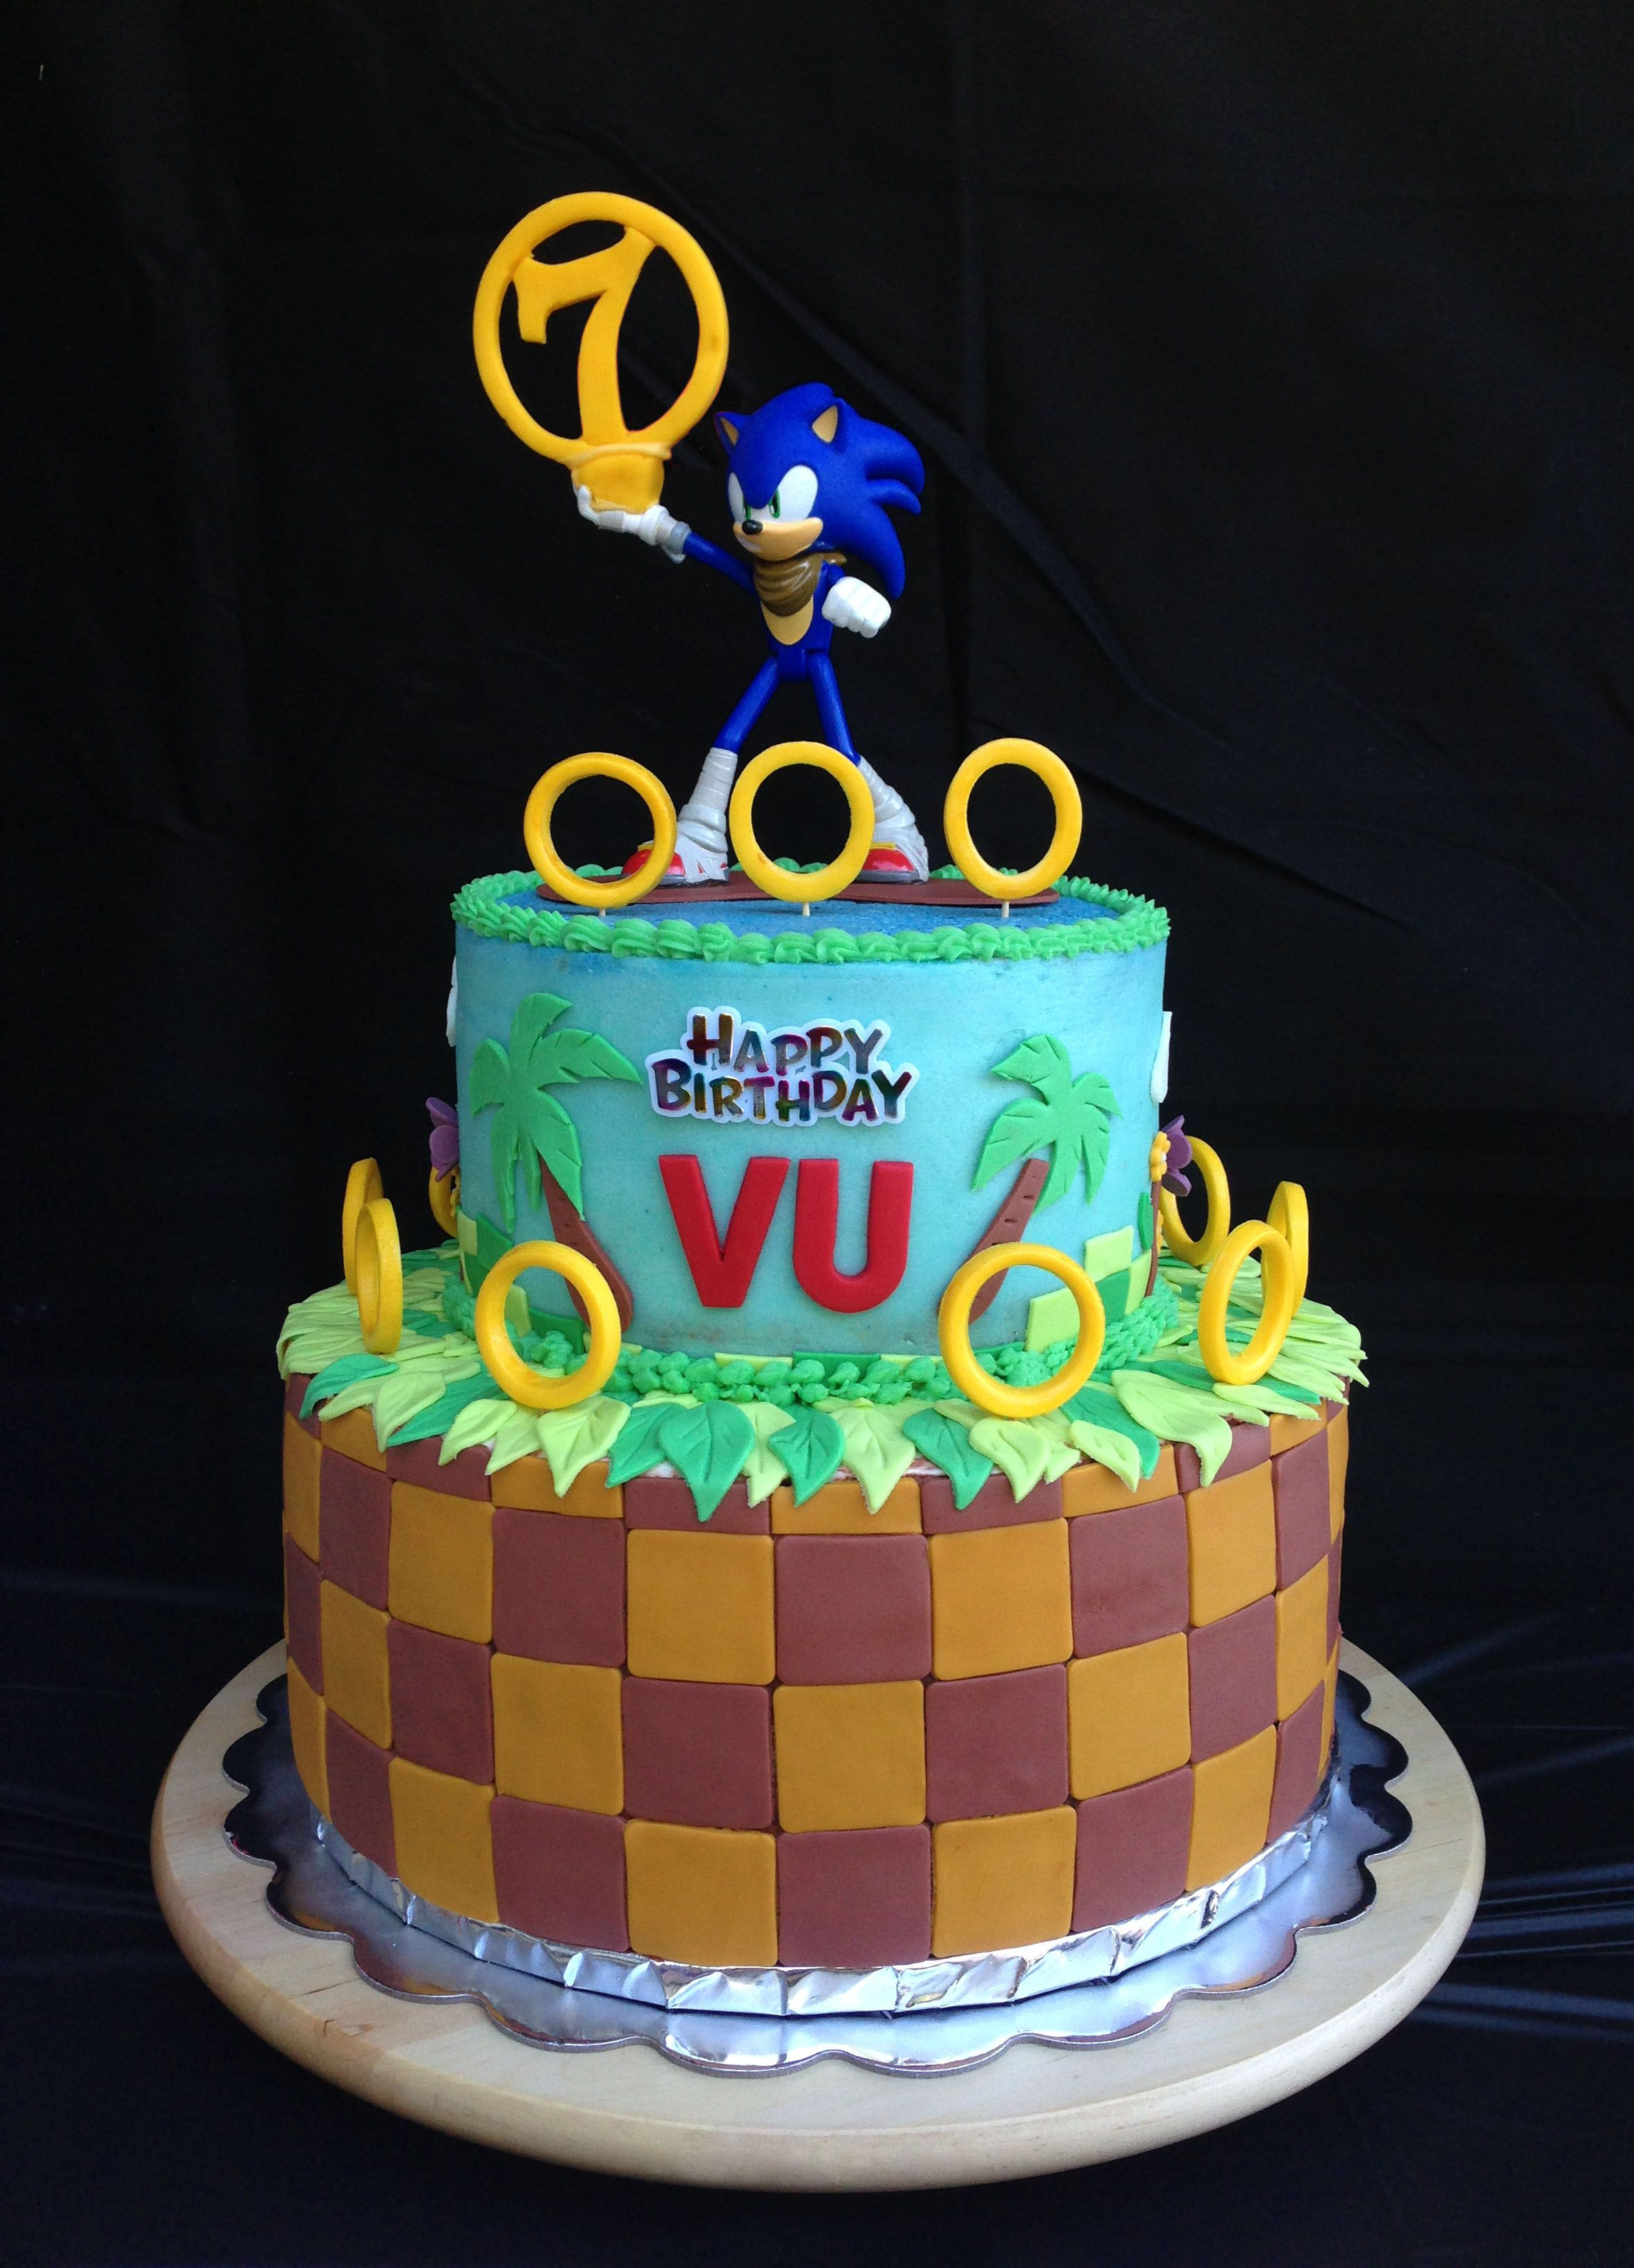 7th Birthday Cake Sonic The Hedgehog Bday Cake For Vu Cakes